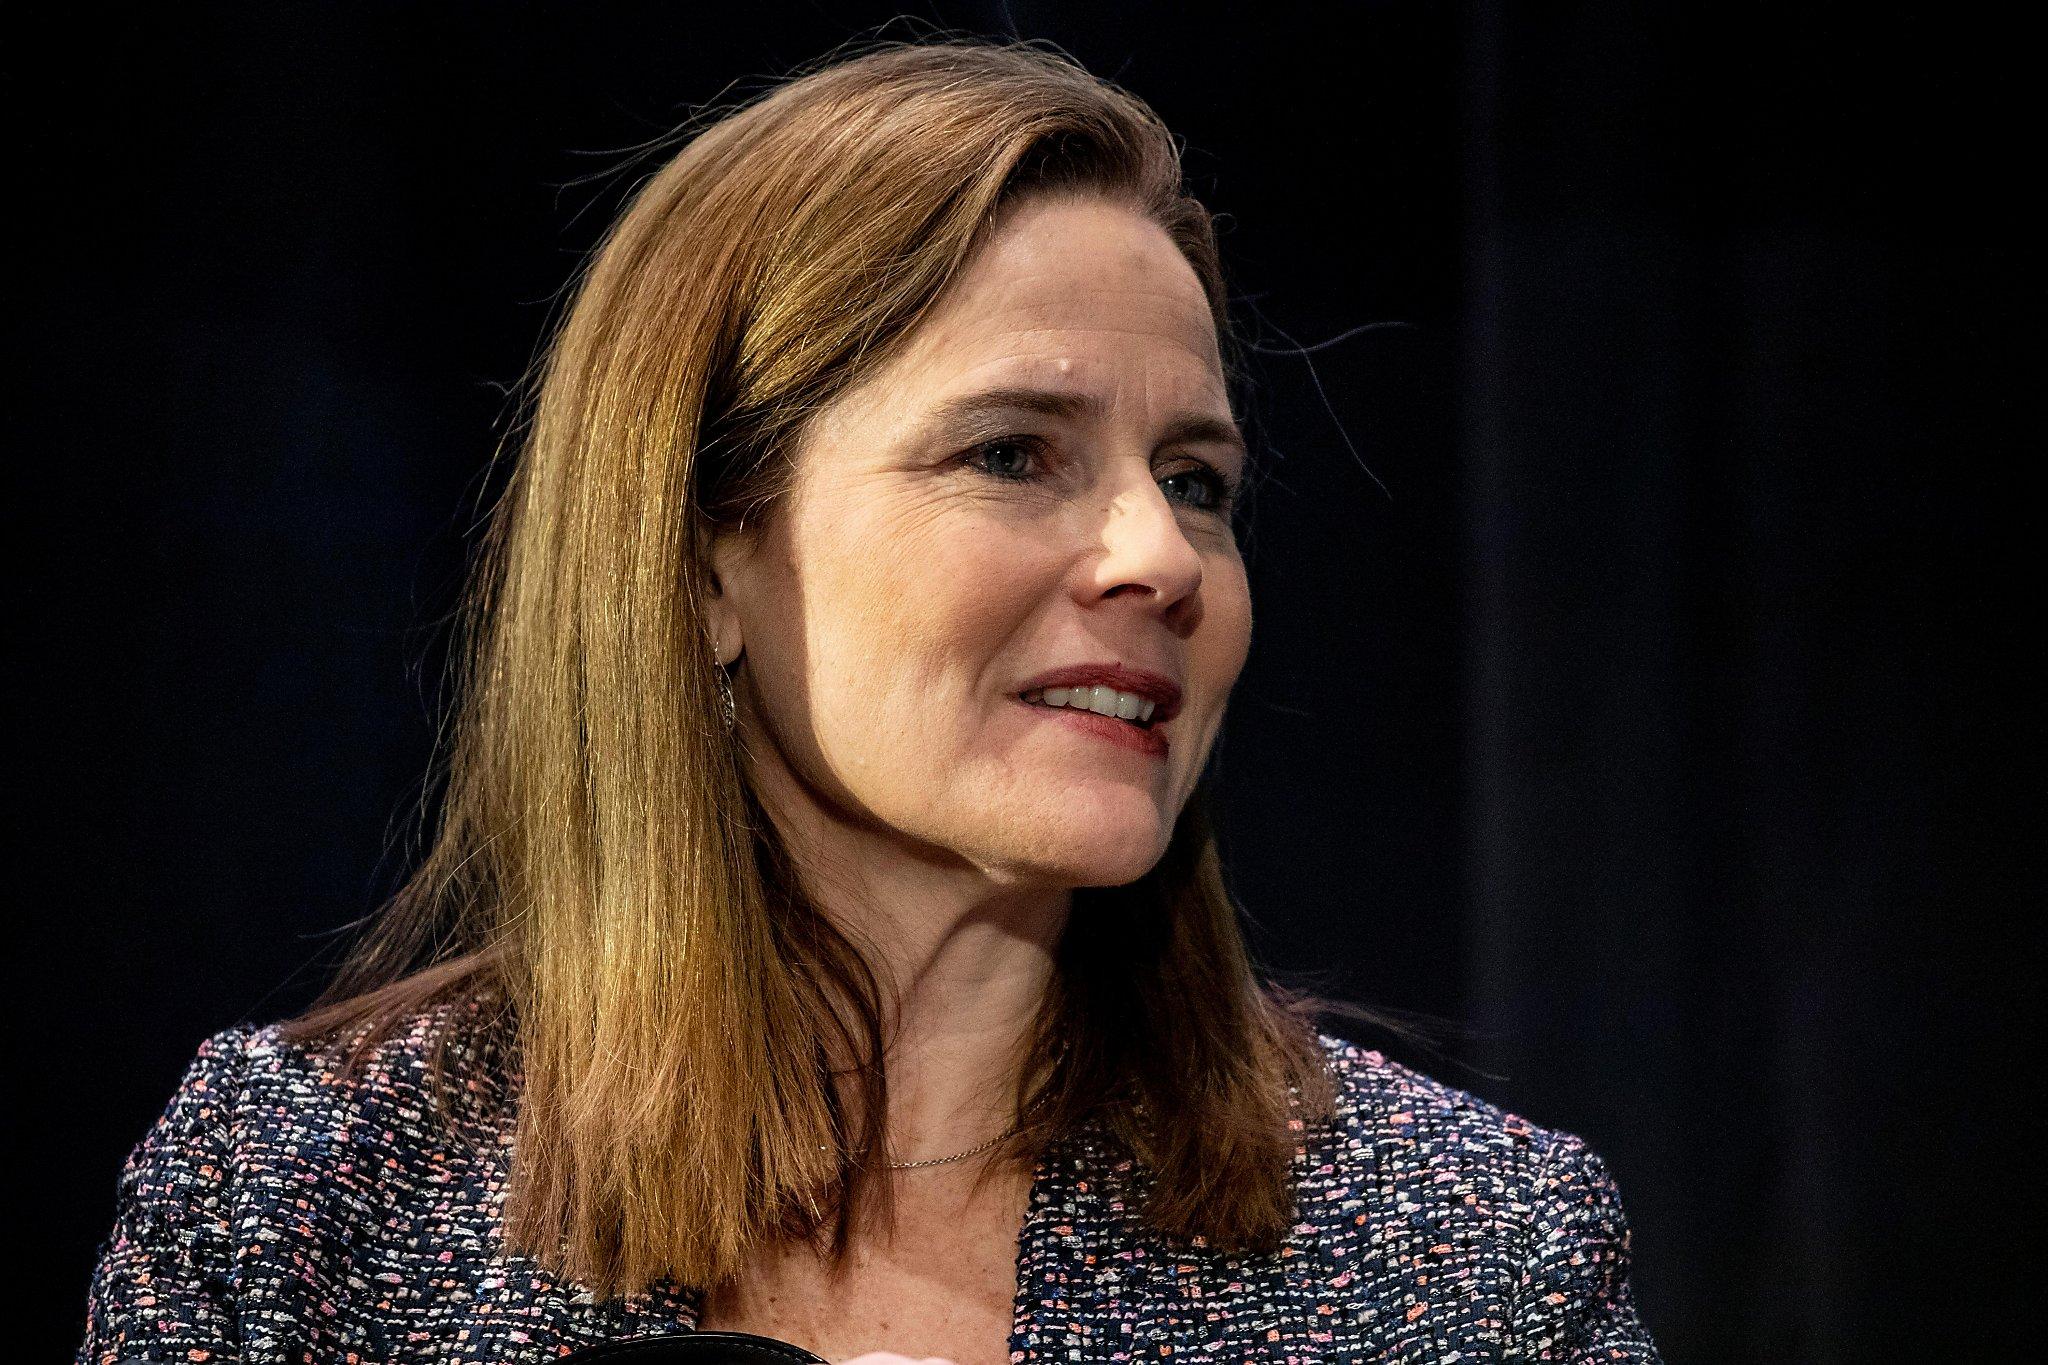 Trump nominates conservative Judge Amy Coney Barrett to U.S. Supreme Court — reaction swift